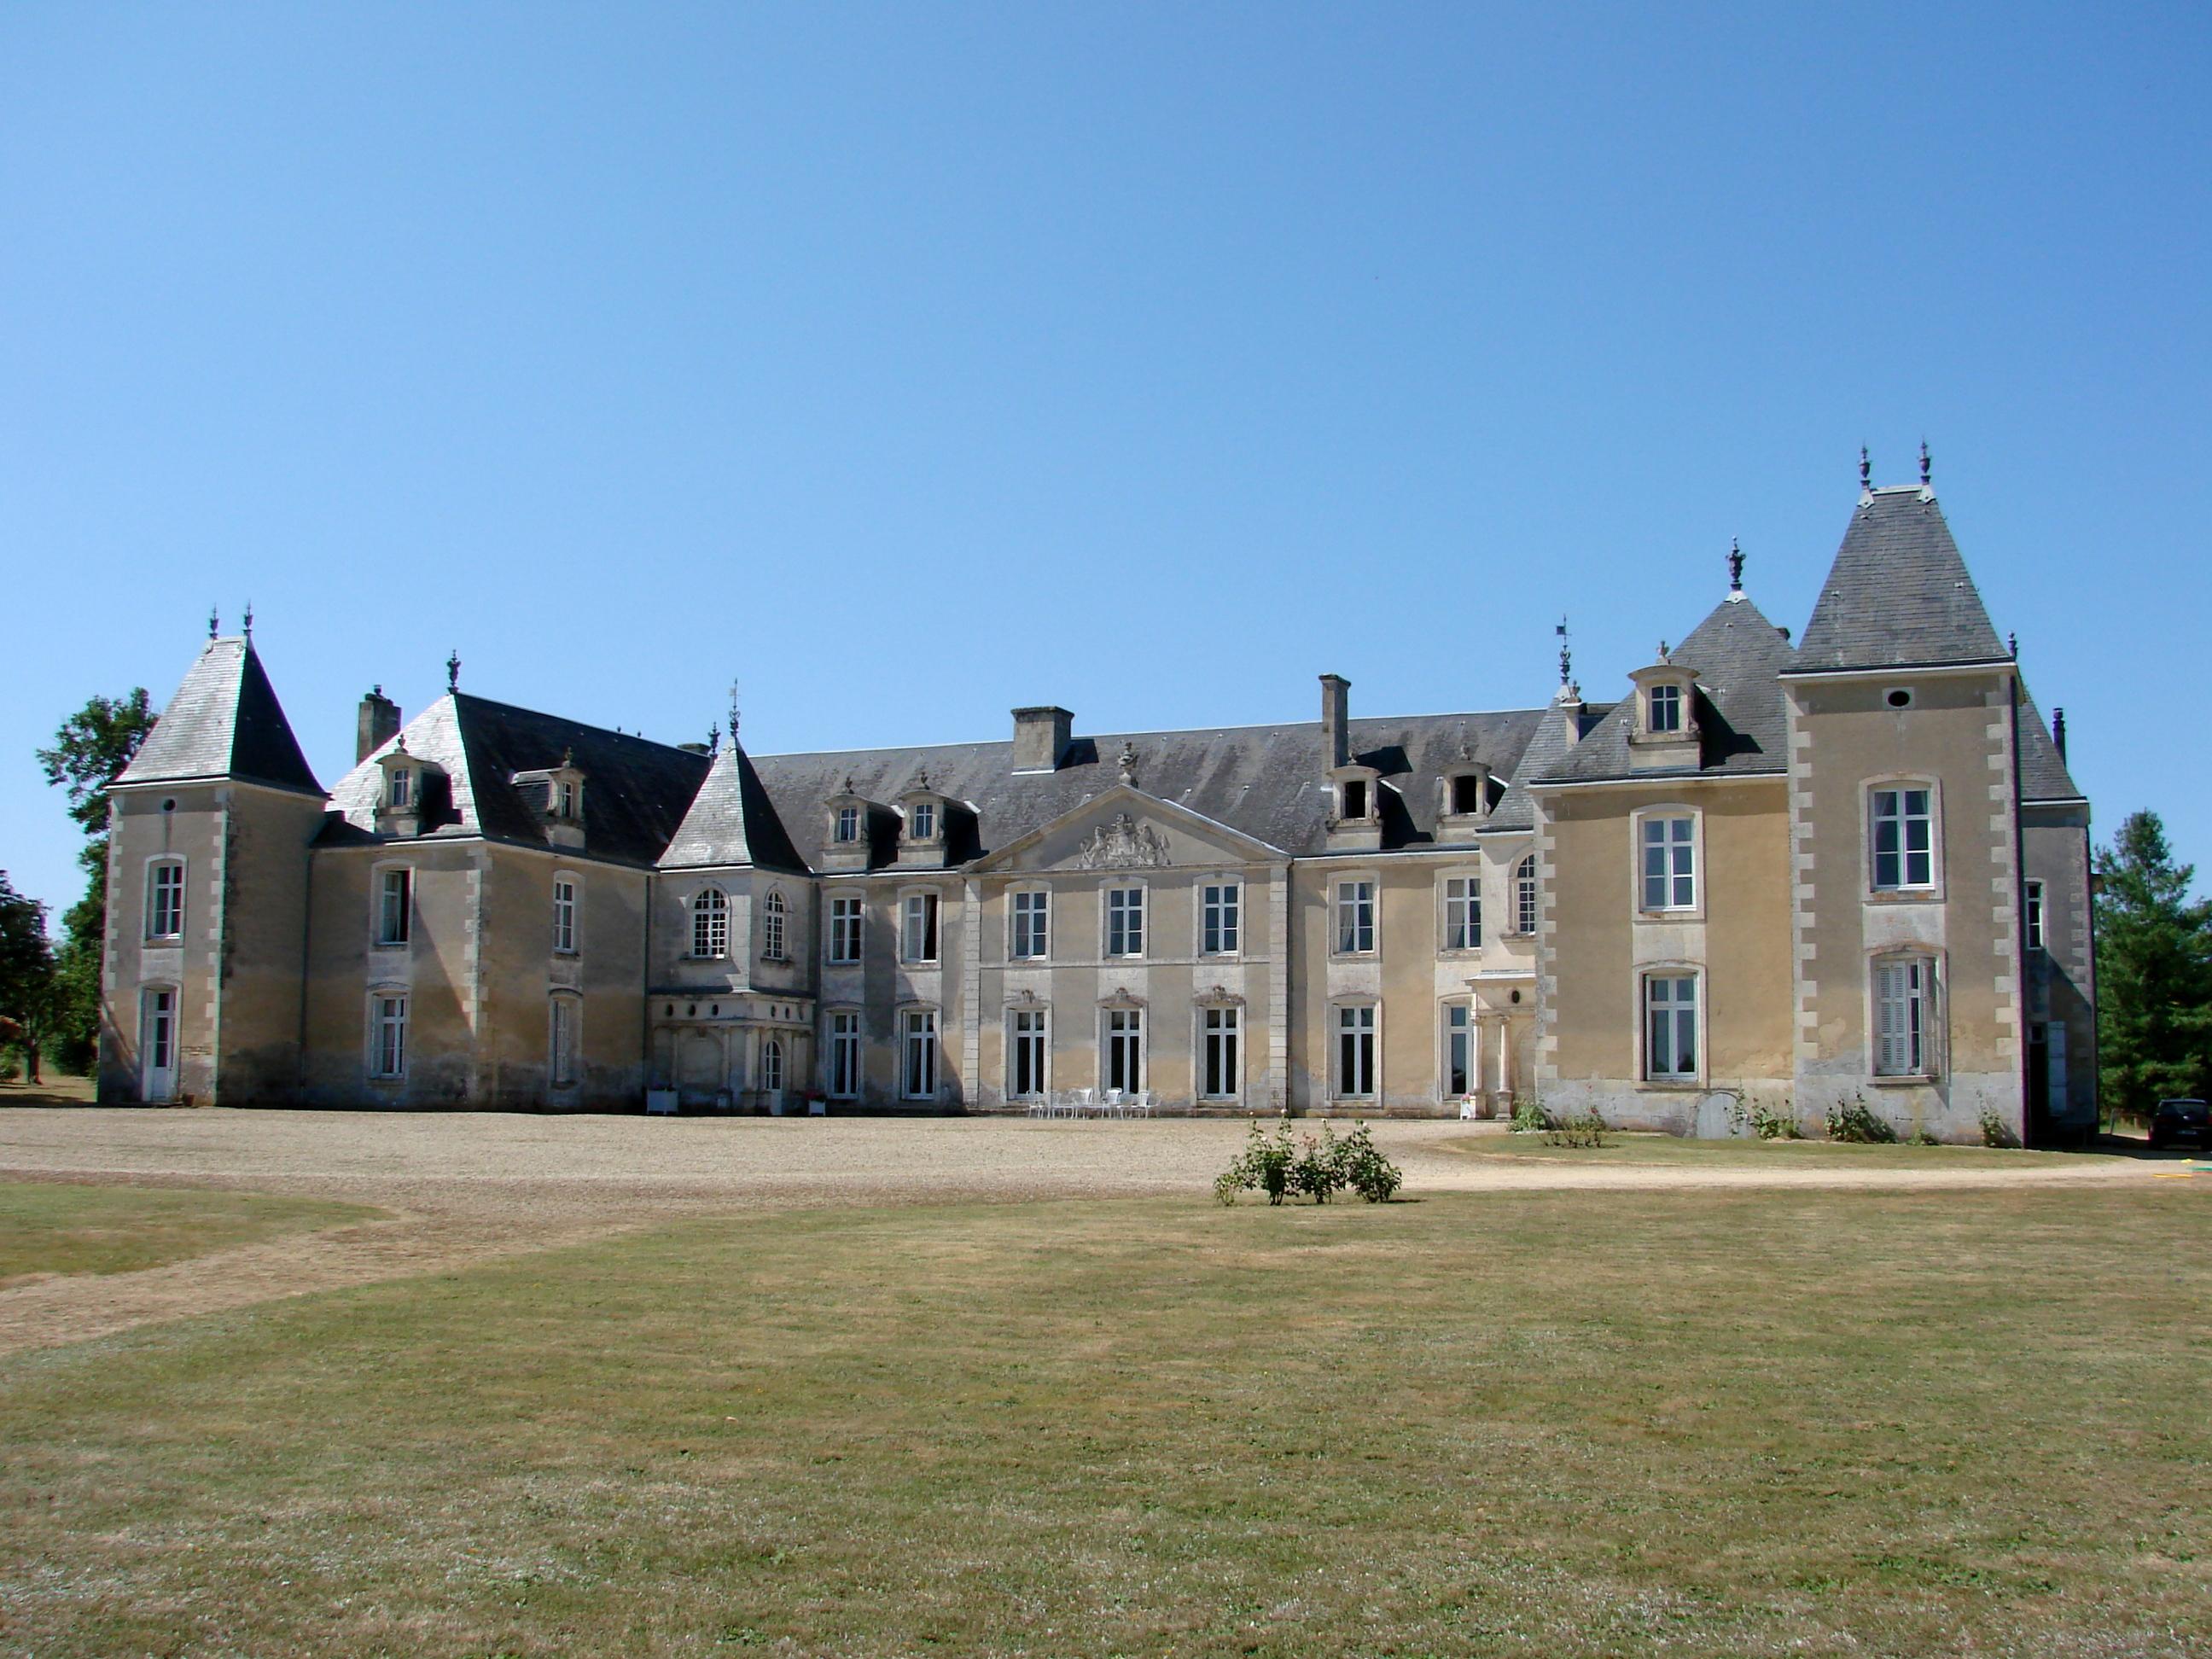 465-chateau_de_panloy_17.jpg